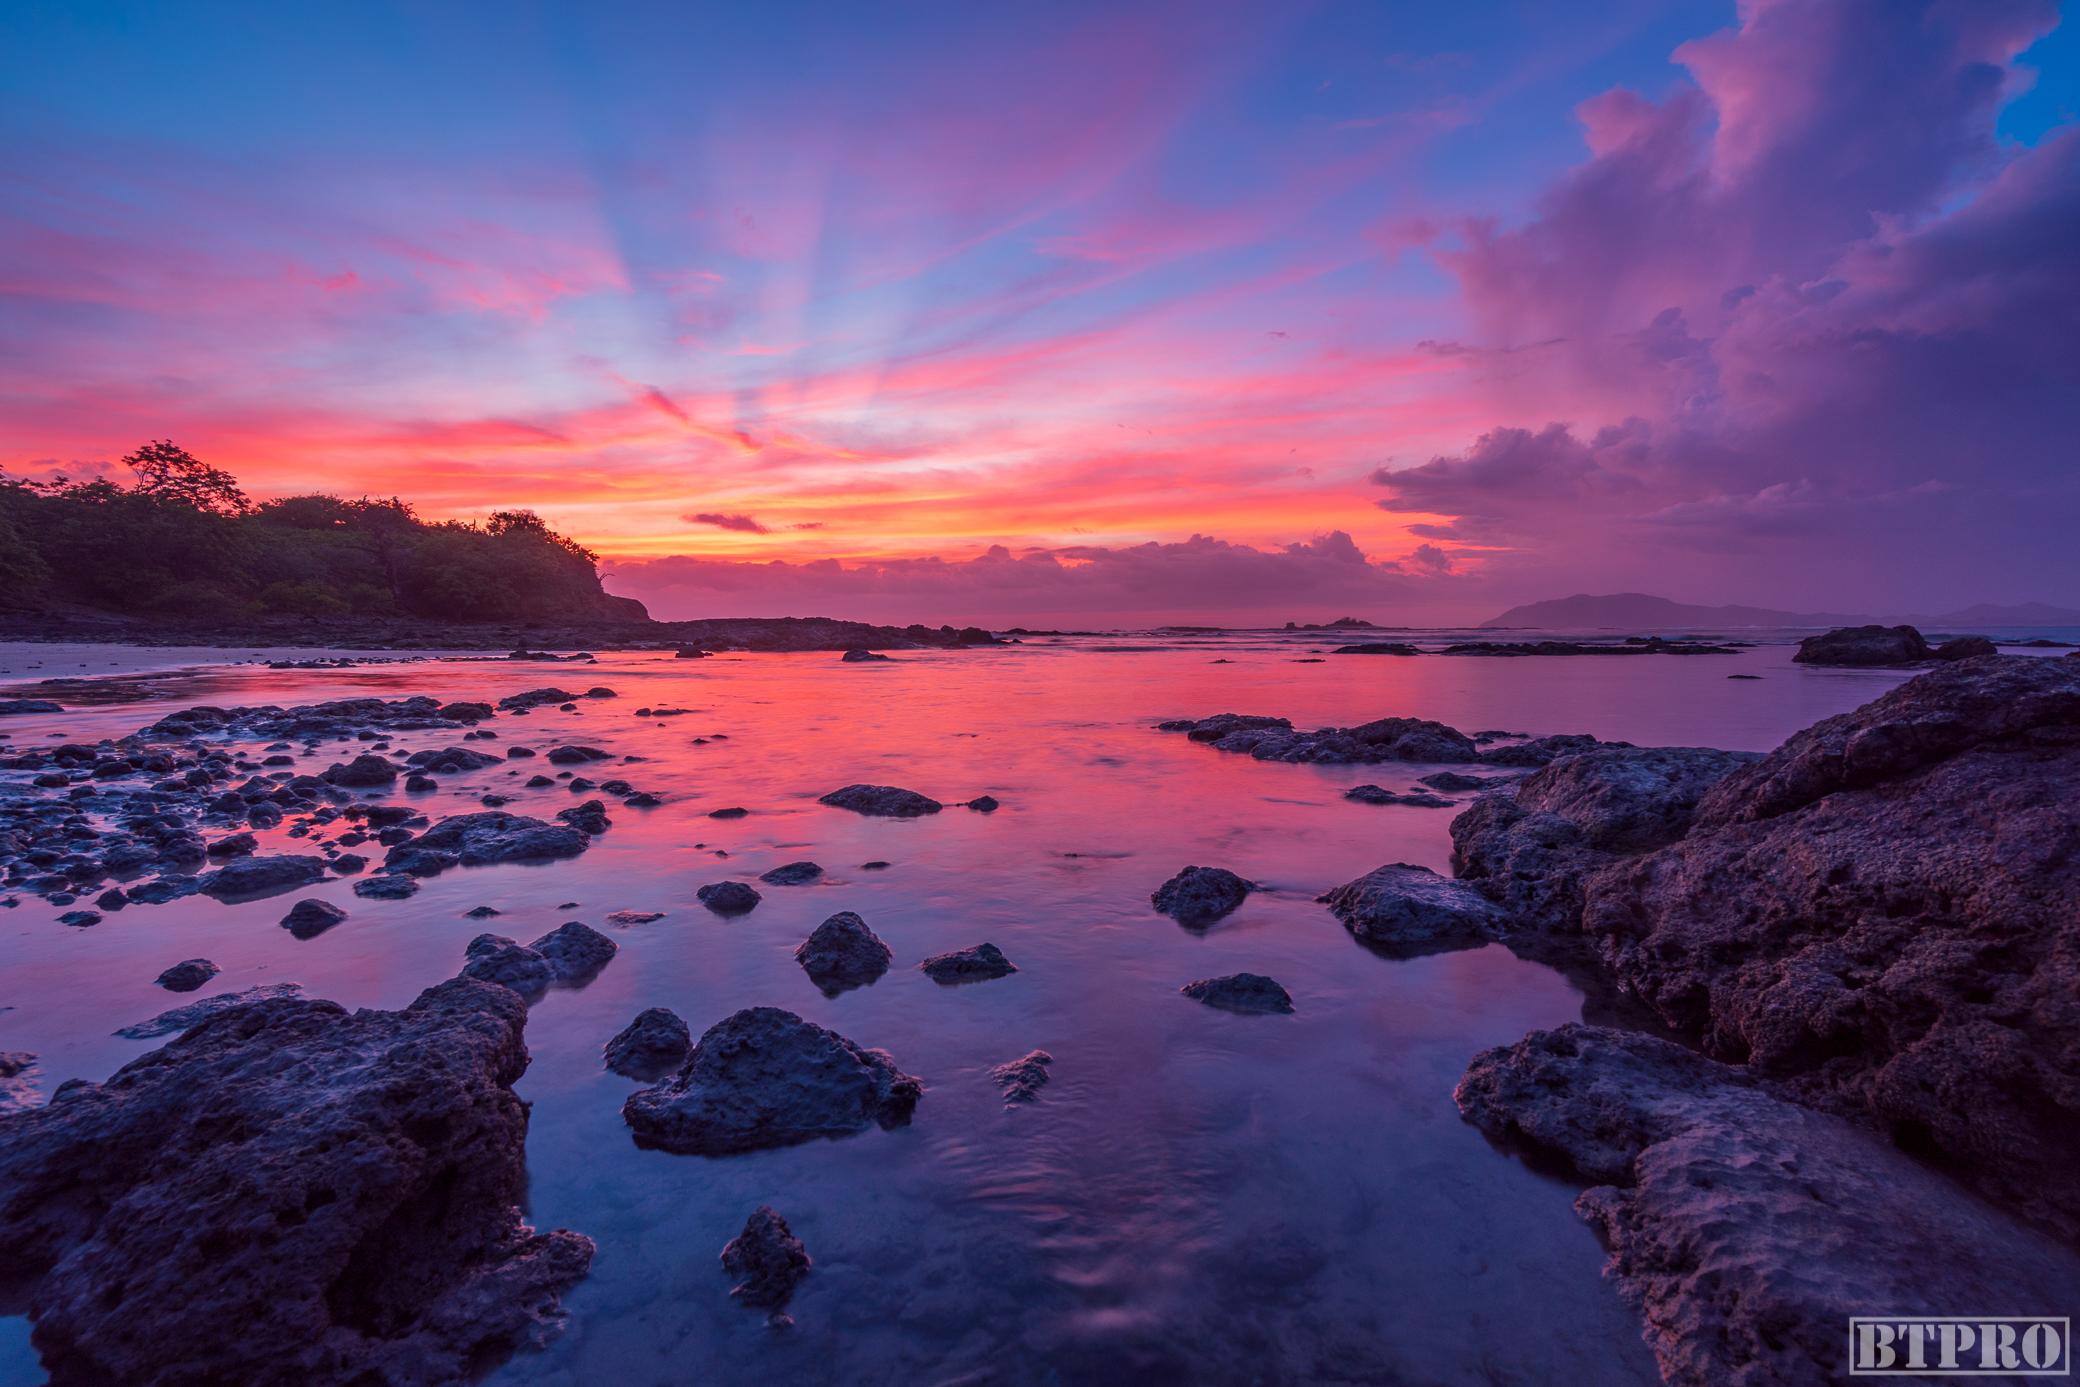 Sunset at the Tamarindo Tidepools